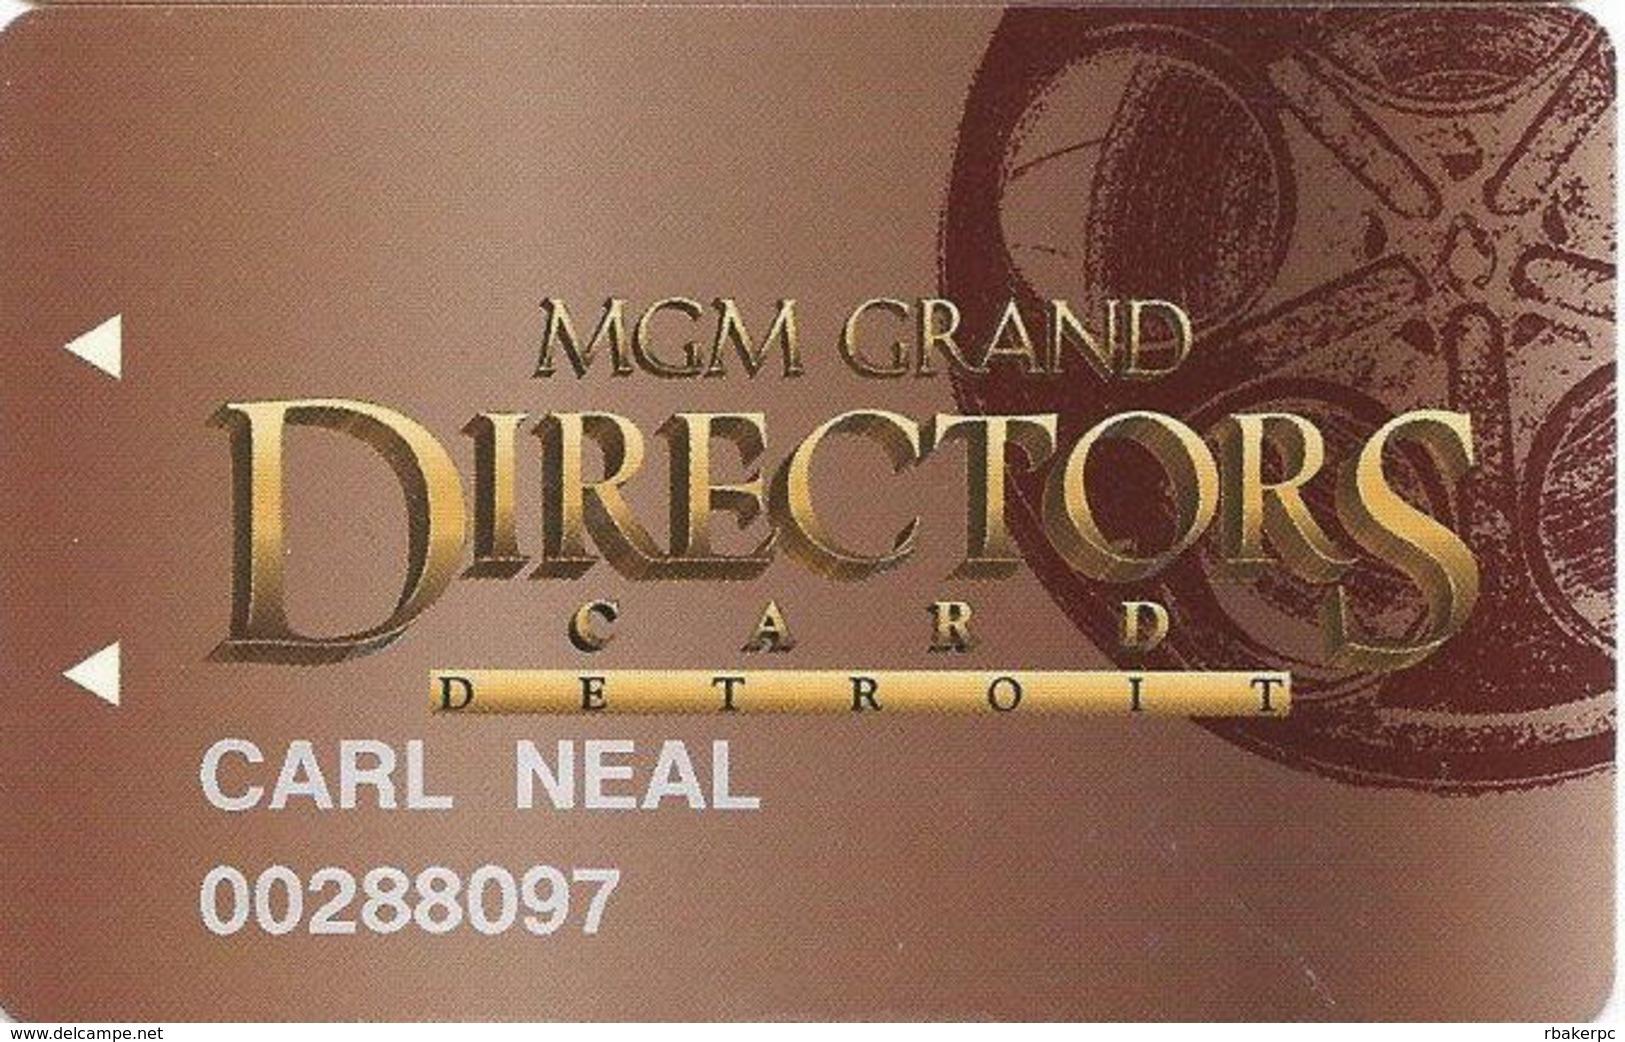 MGM Grand Casino - Detroit, MI - 2nd Issue Slot Card - Casino Cards